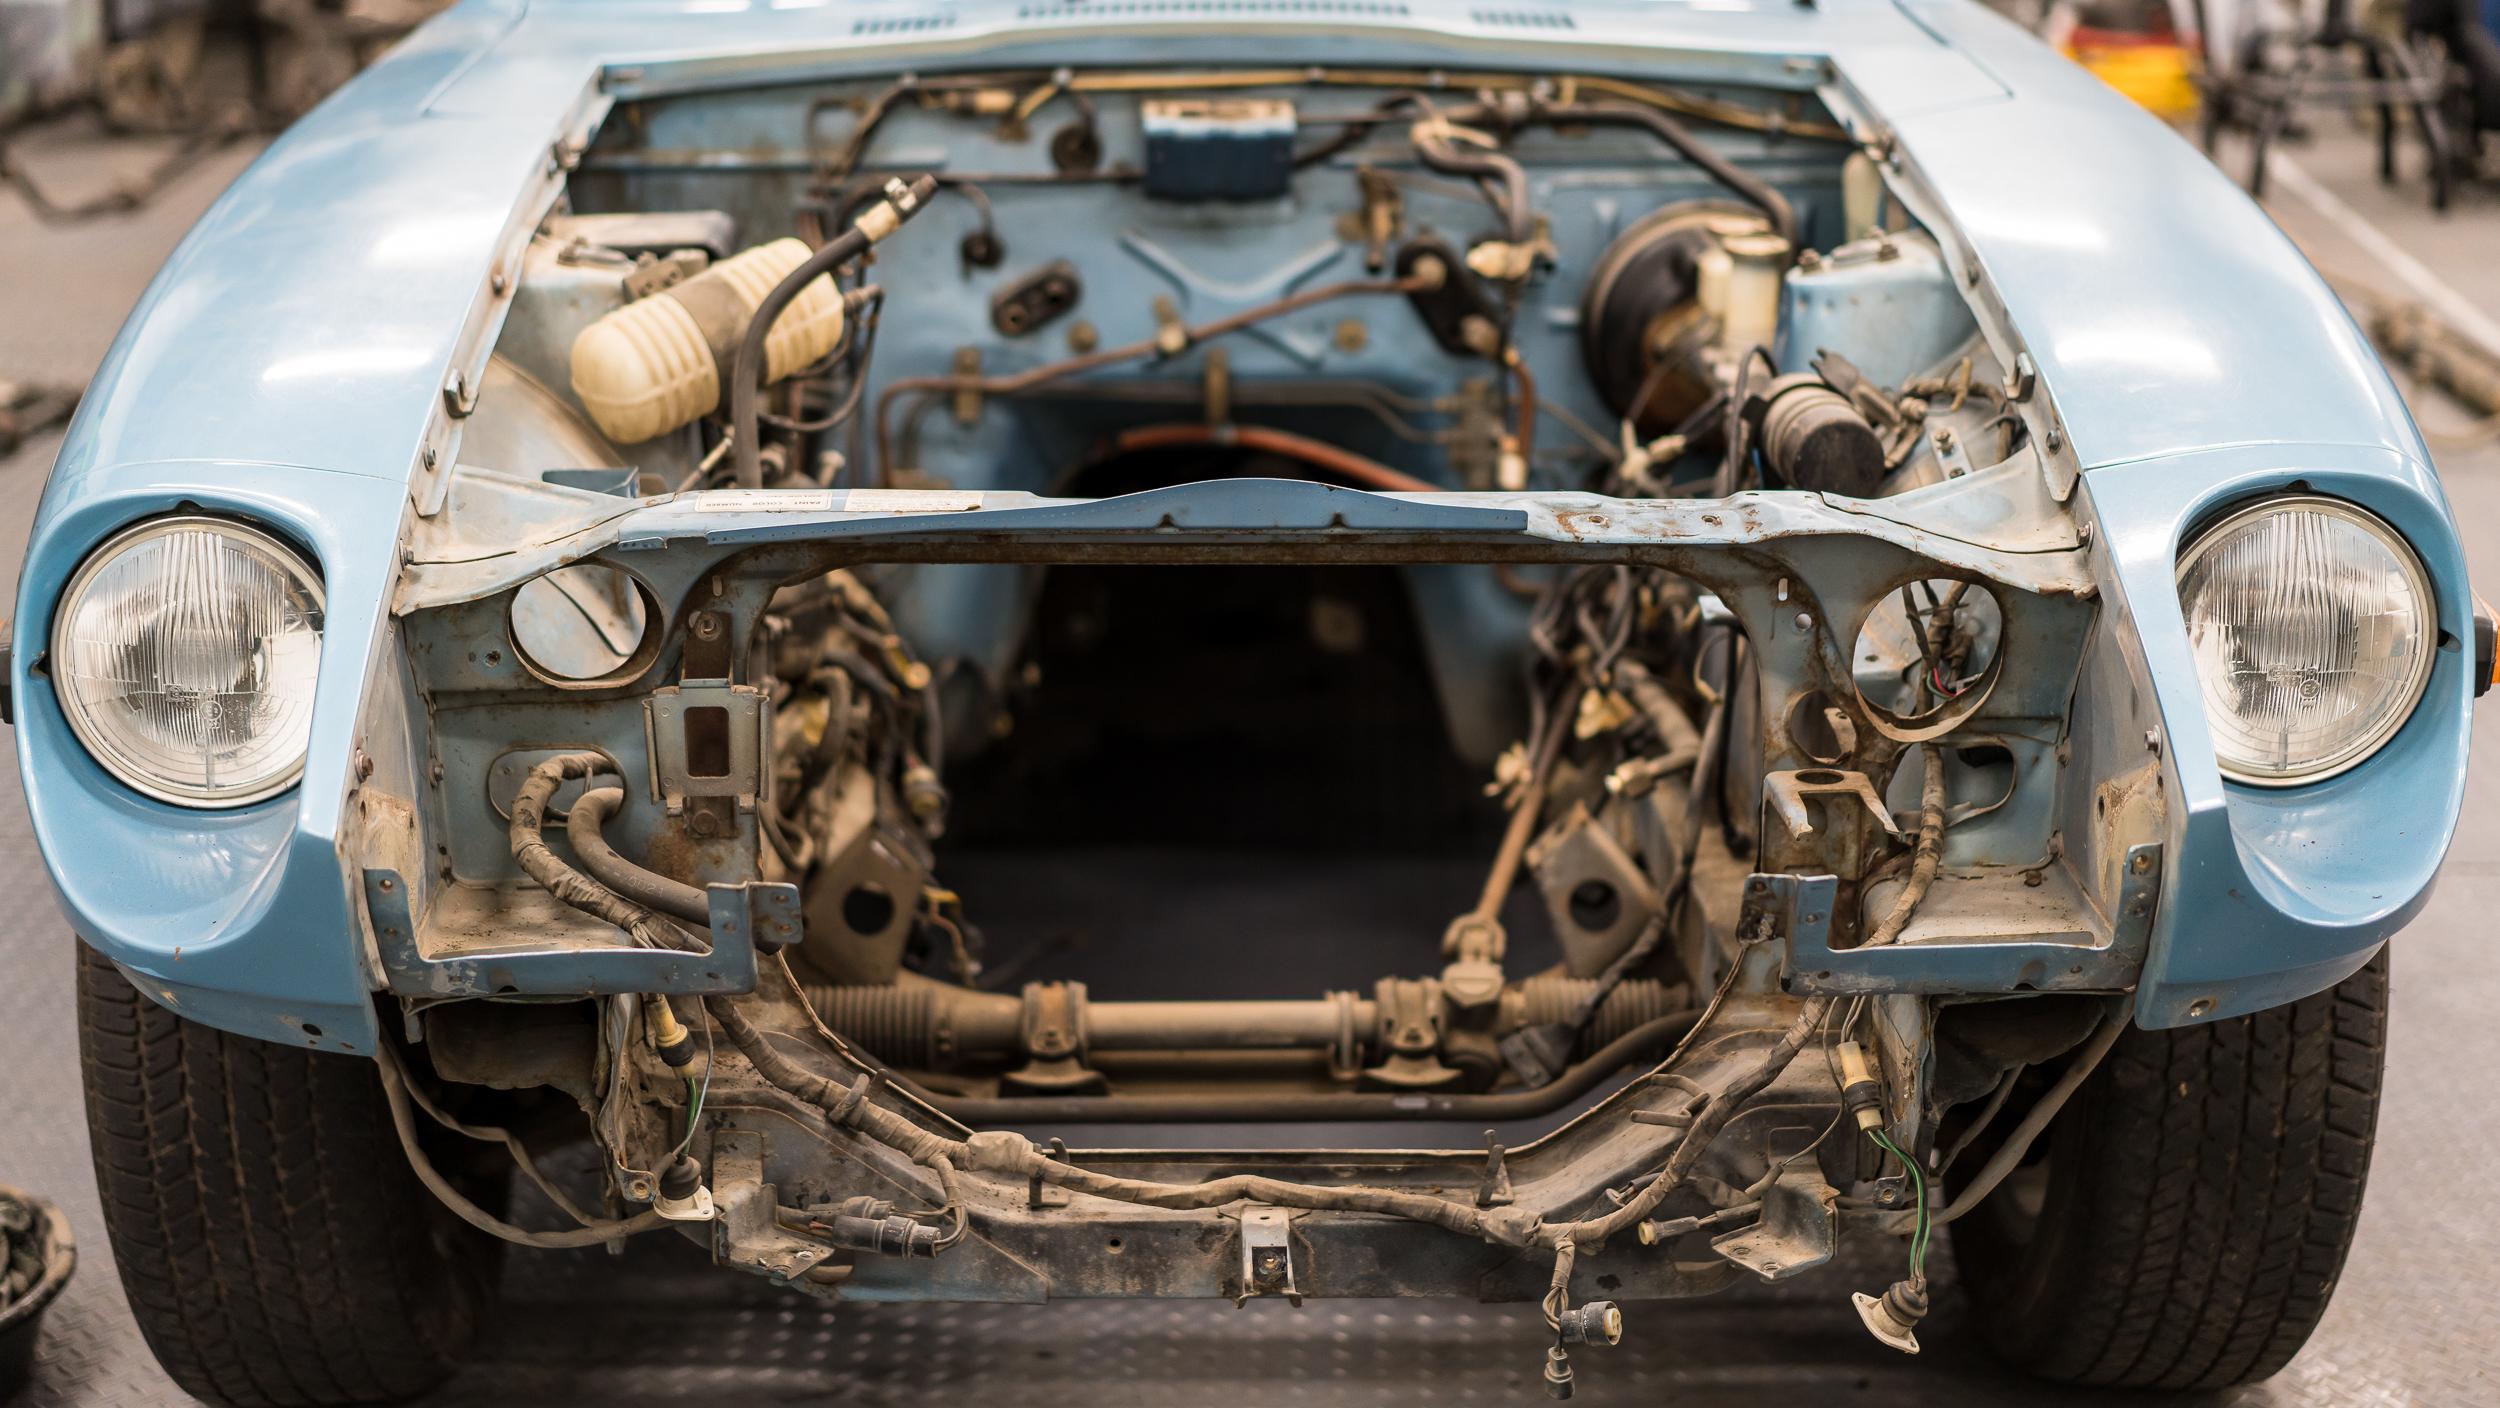 600hp v8 280z: engine bay cleanup — bad way to live  datsun